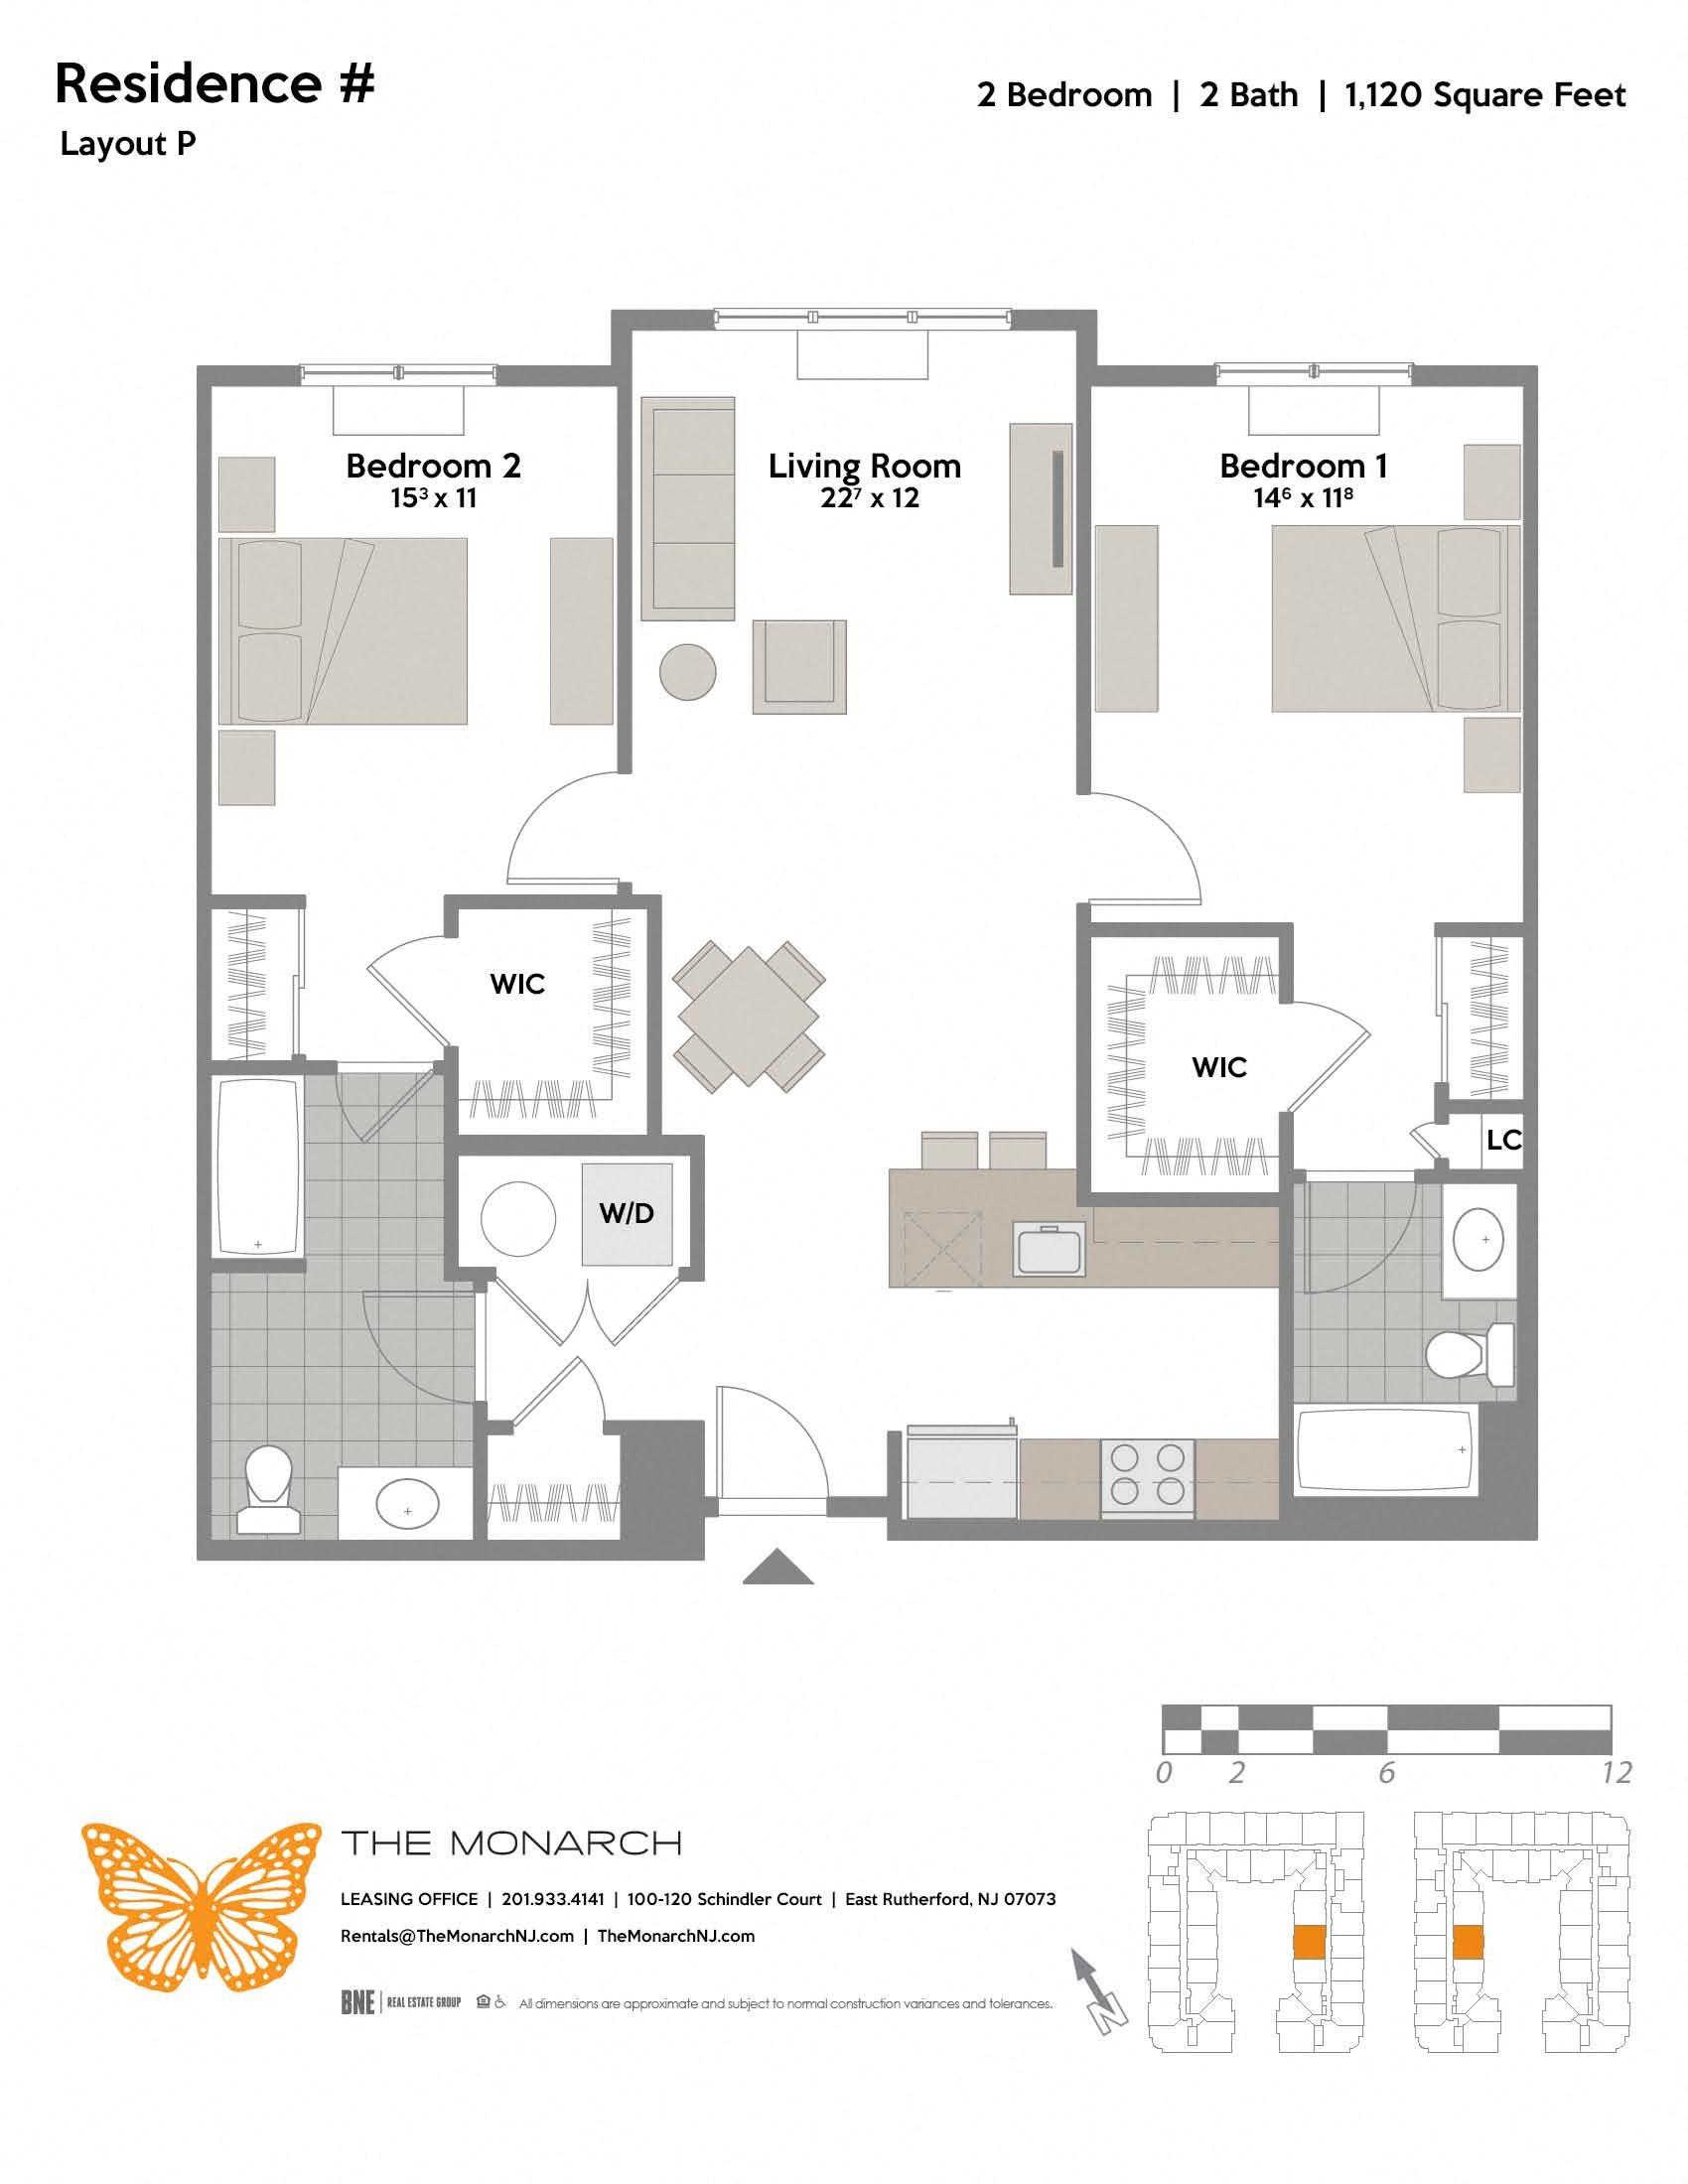 Layout P Floor Plan 3